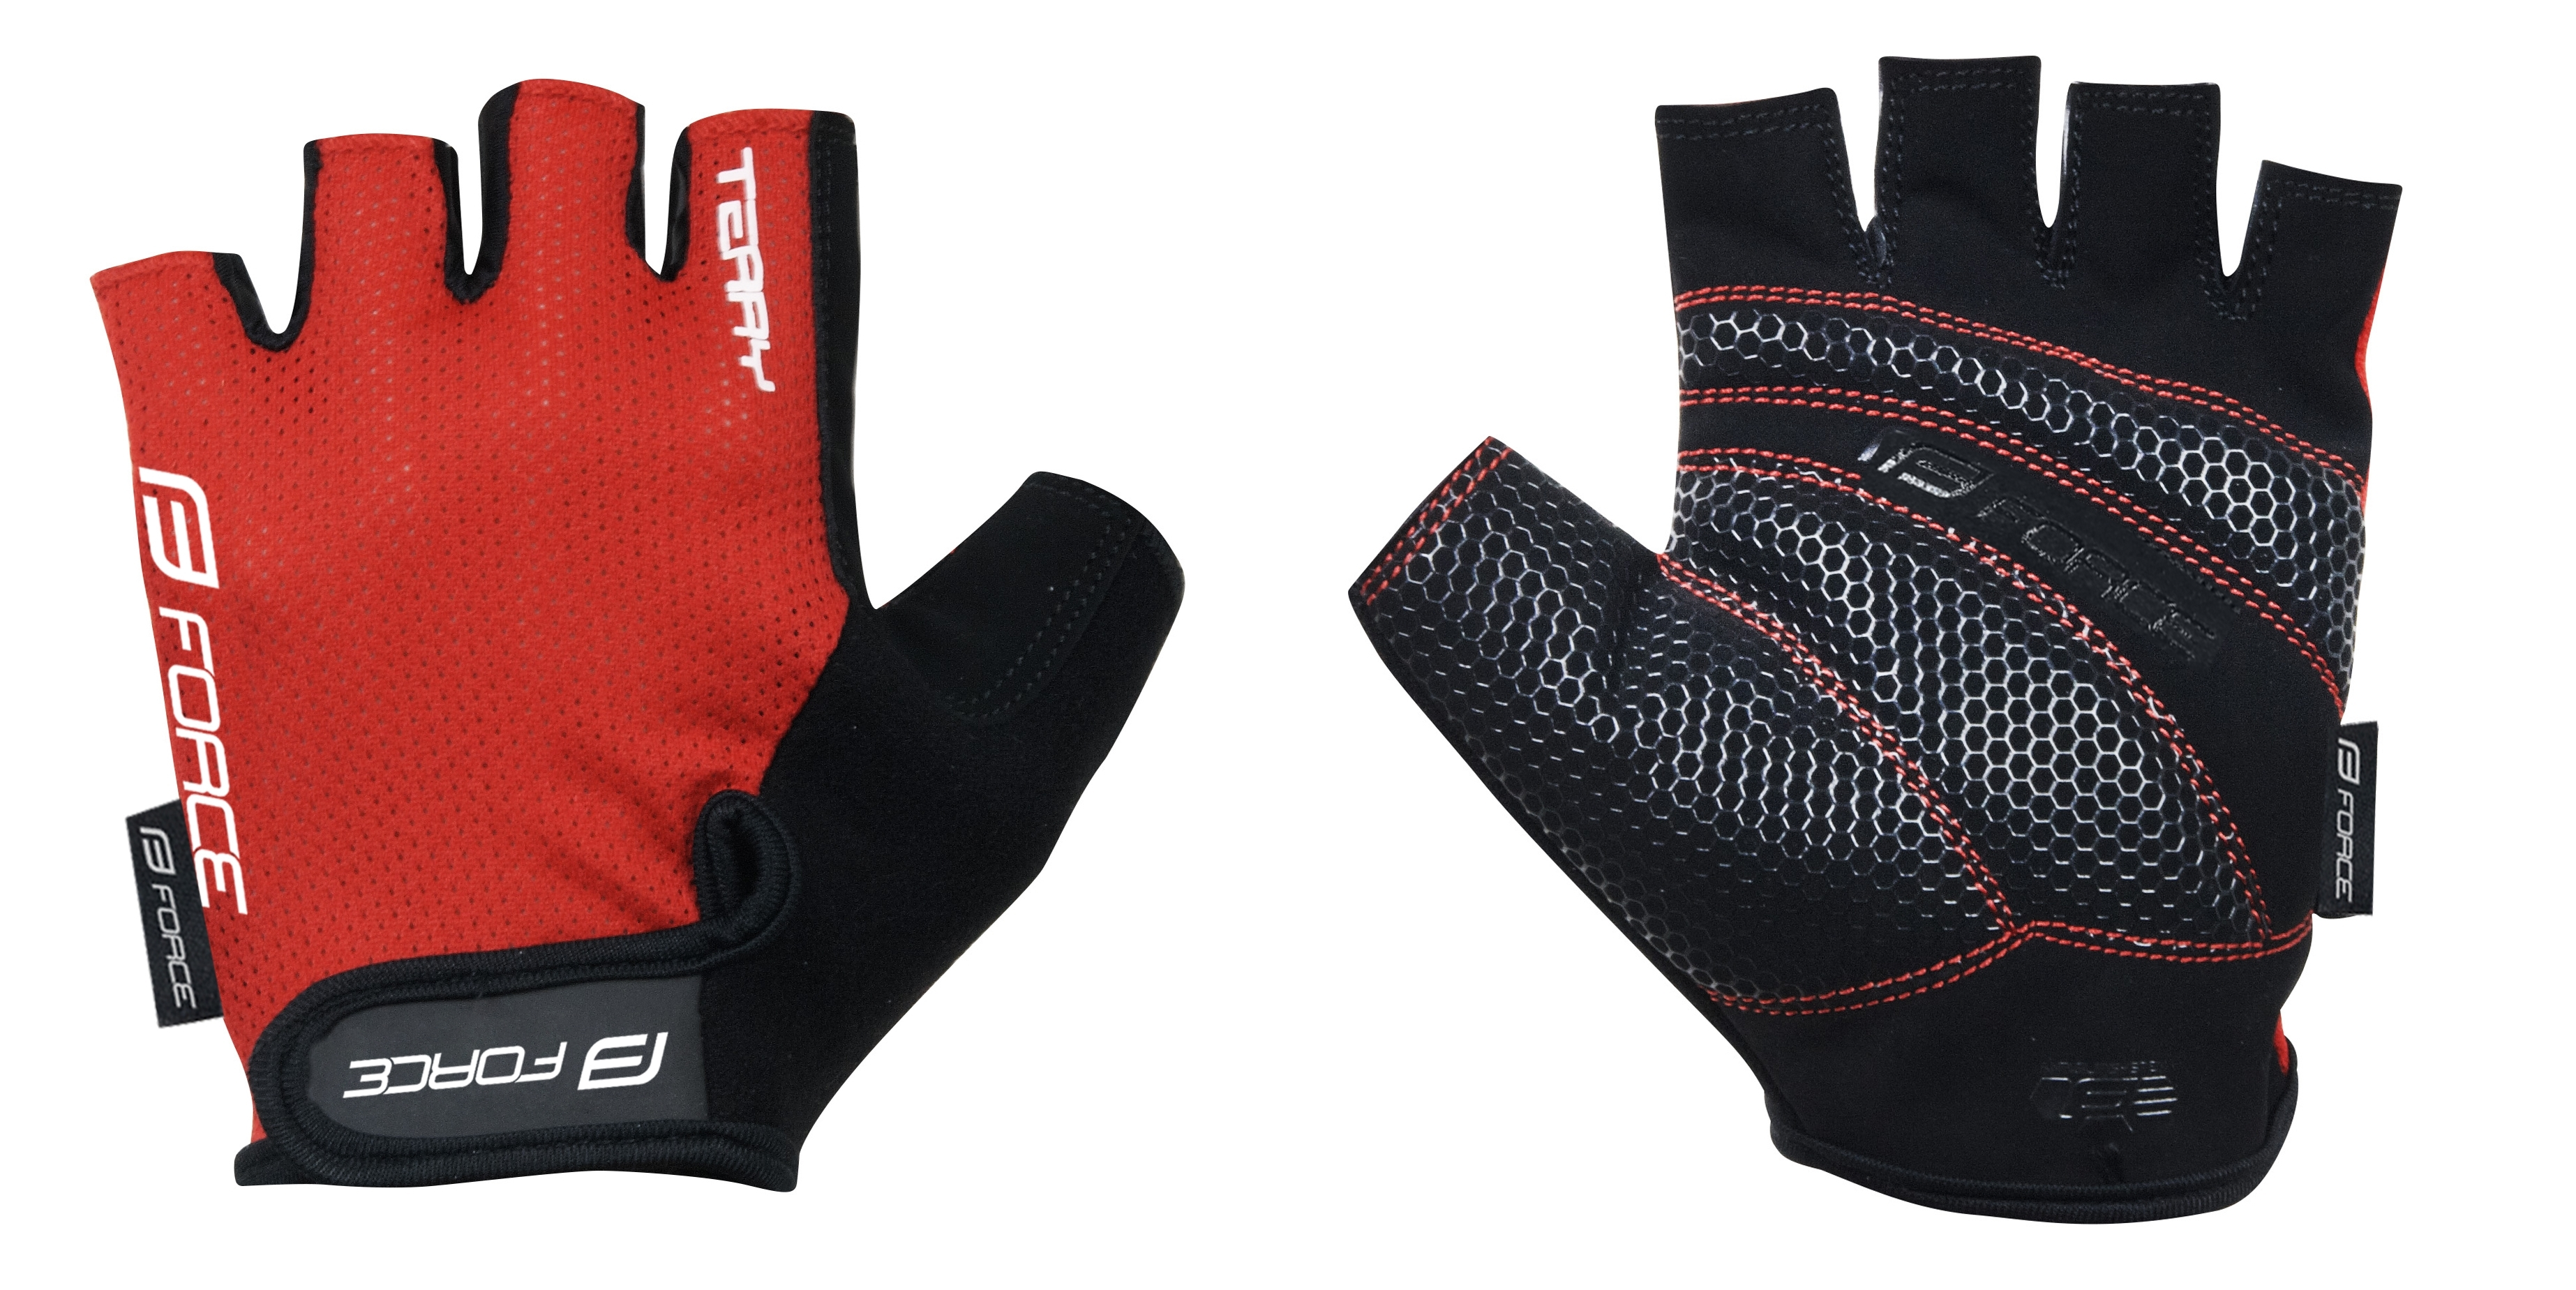 rukavice FORCE TERRY, červené XL